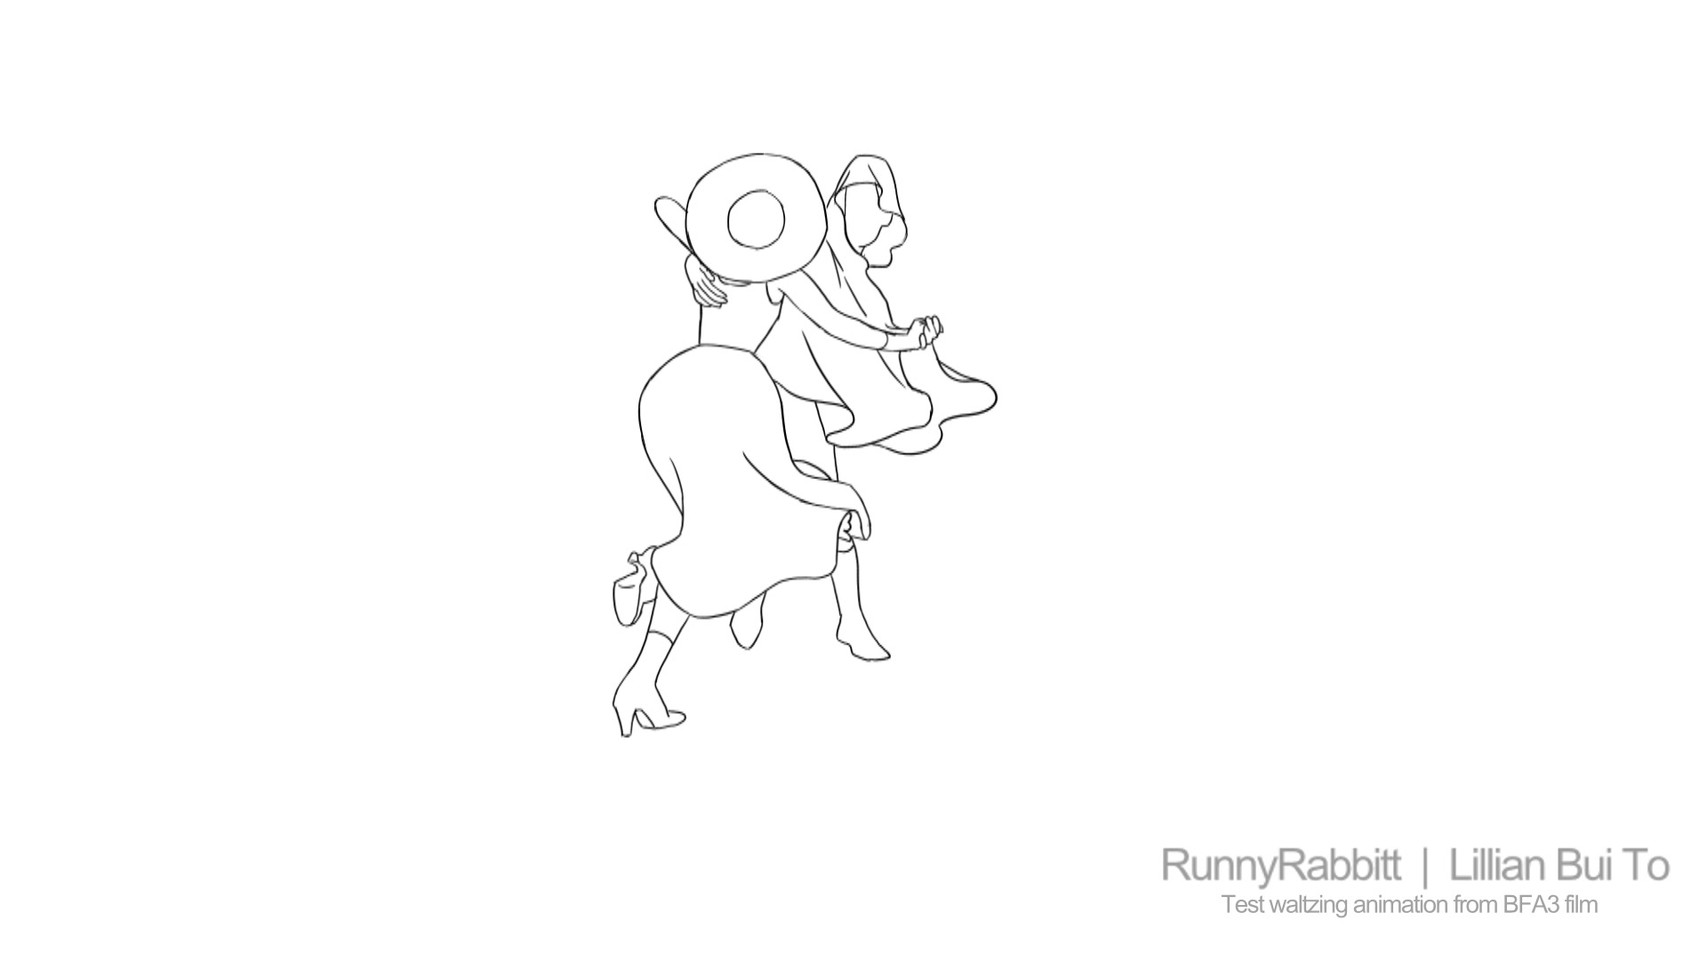 Low FPS waltz animation